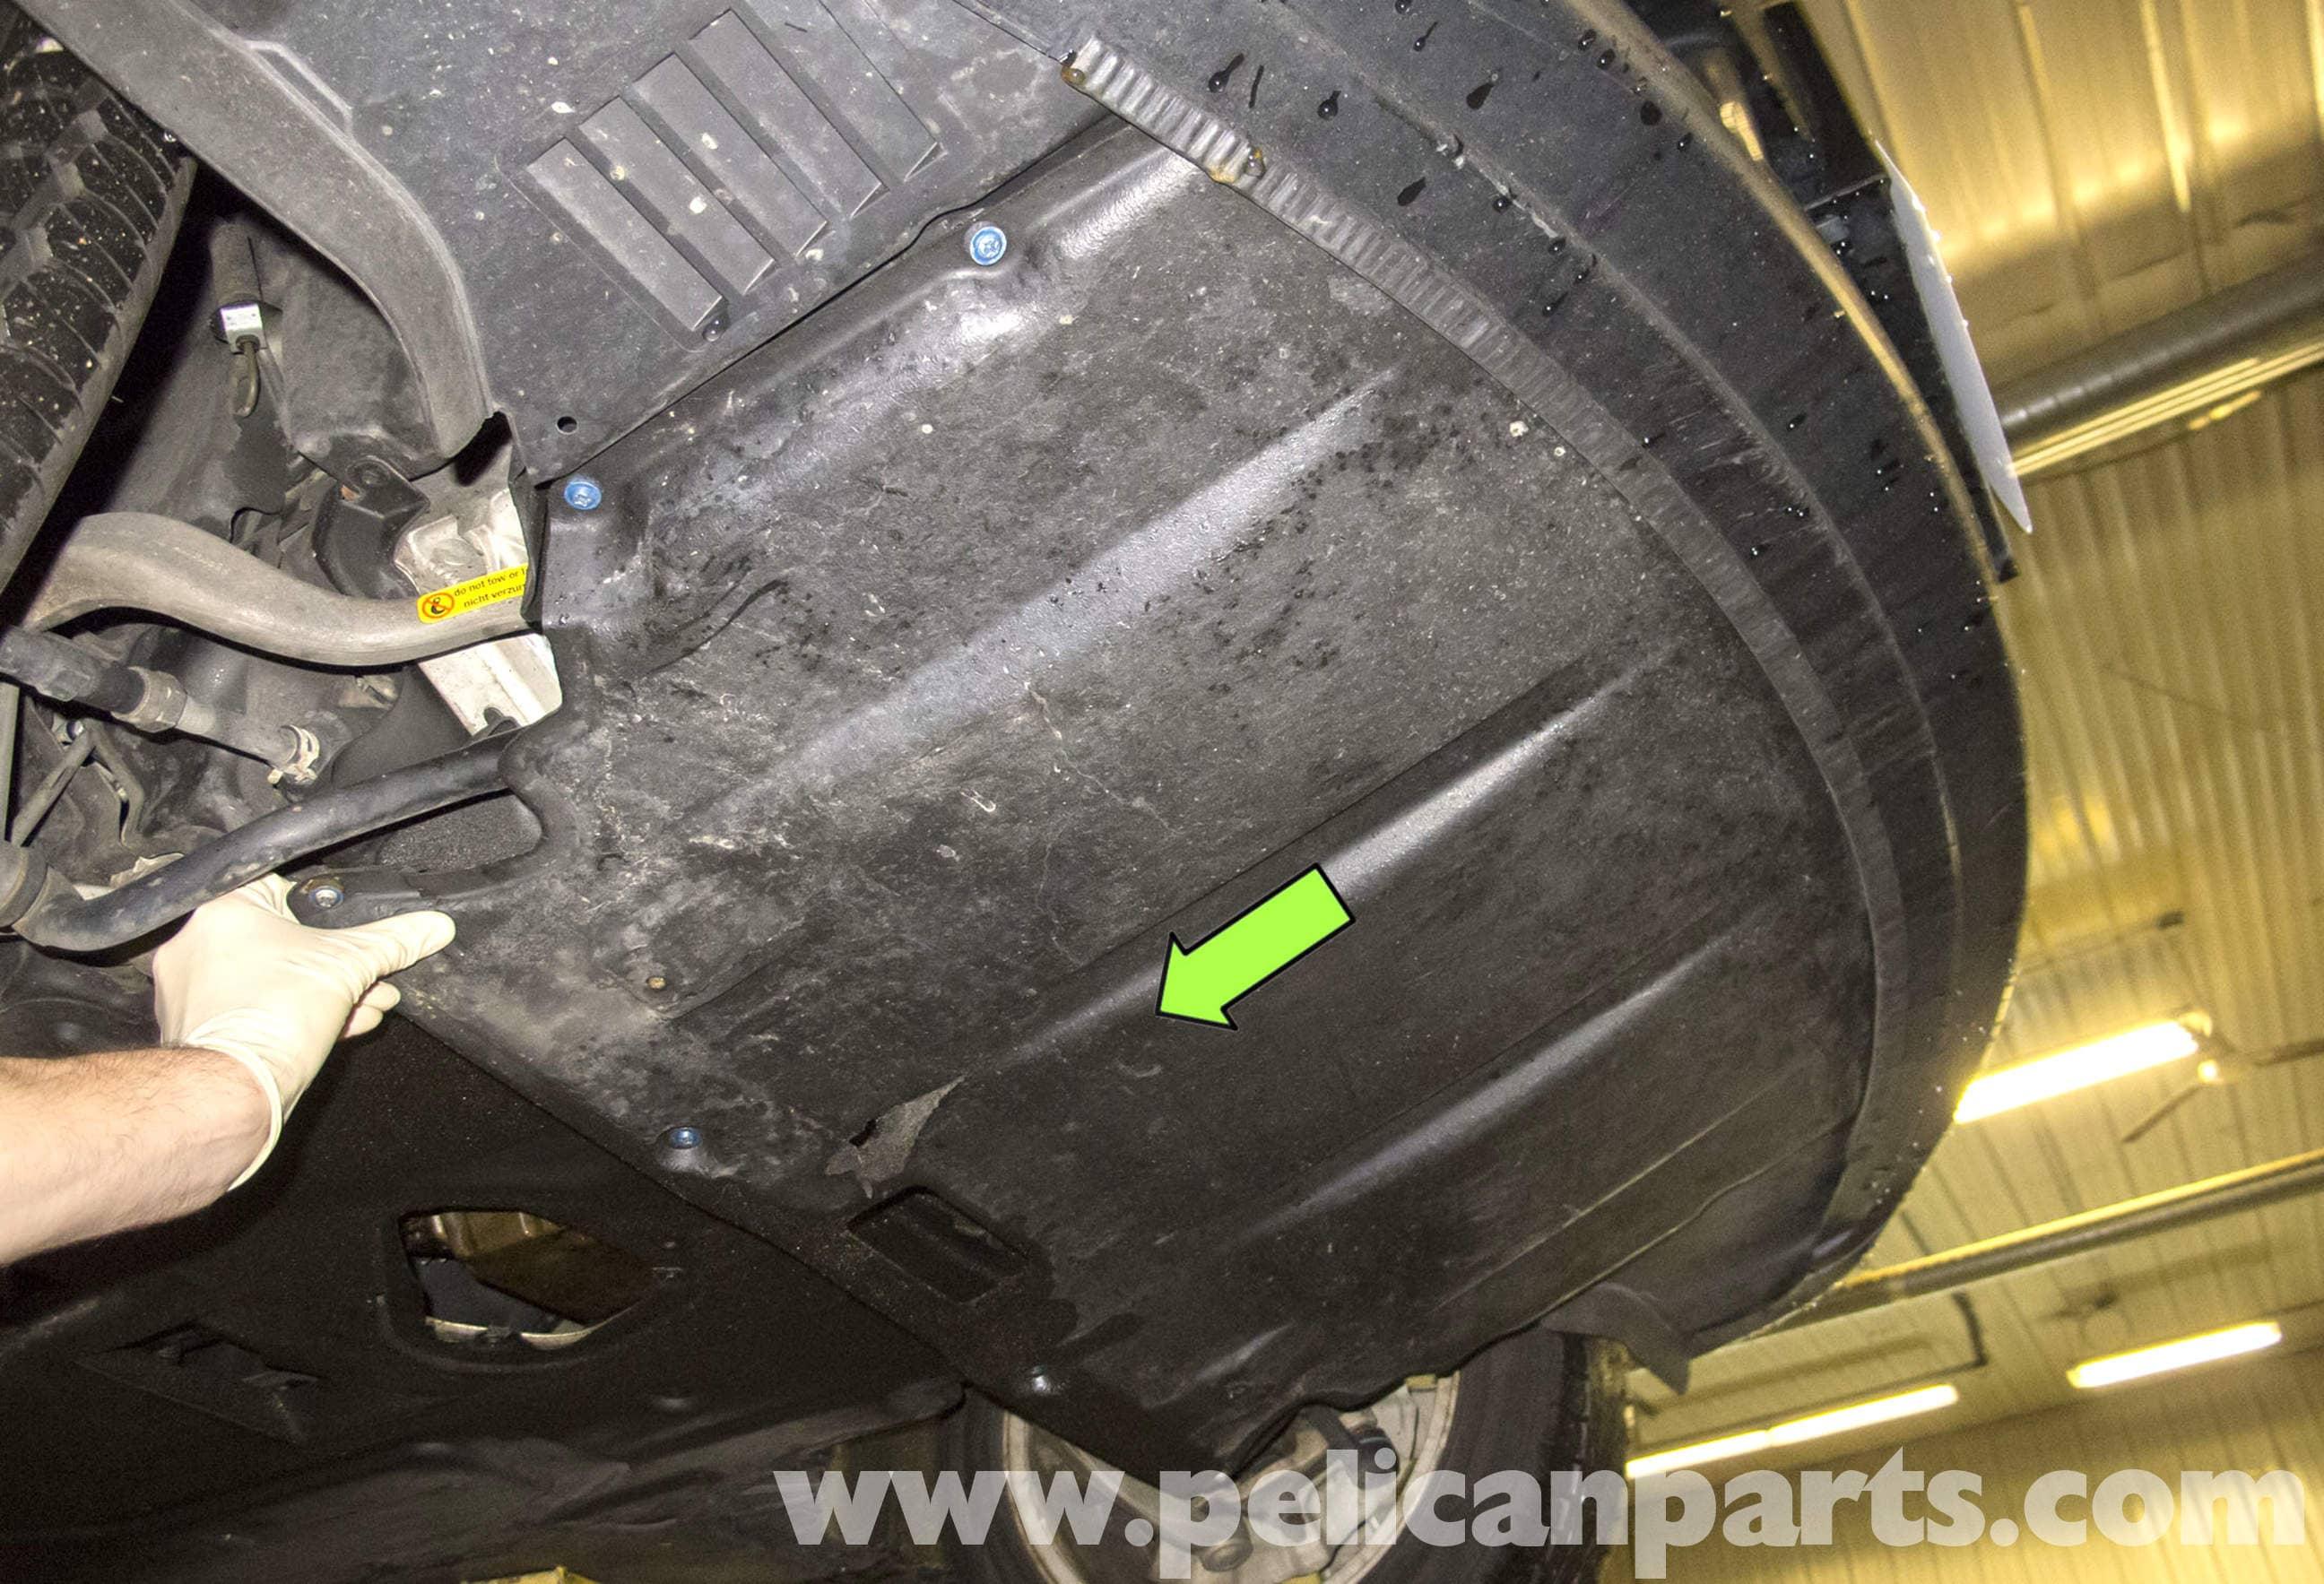 Bmw E60 5 Series Engine Transmission Splash Shield Removal